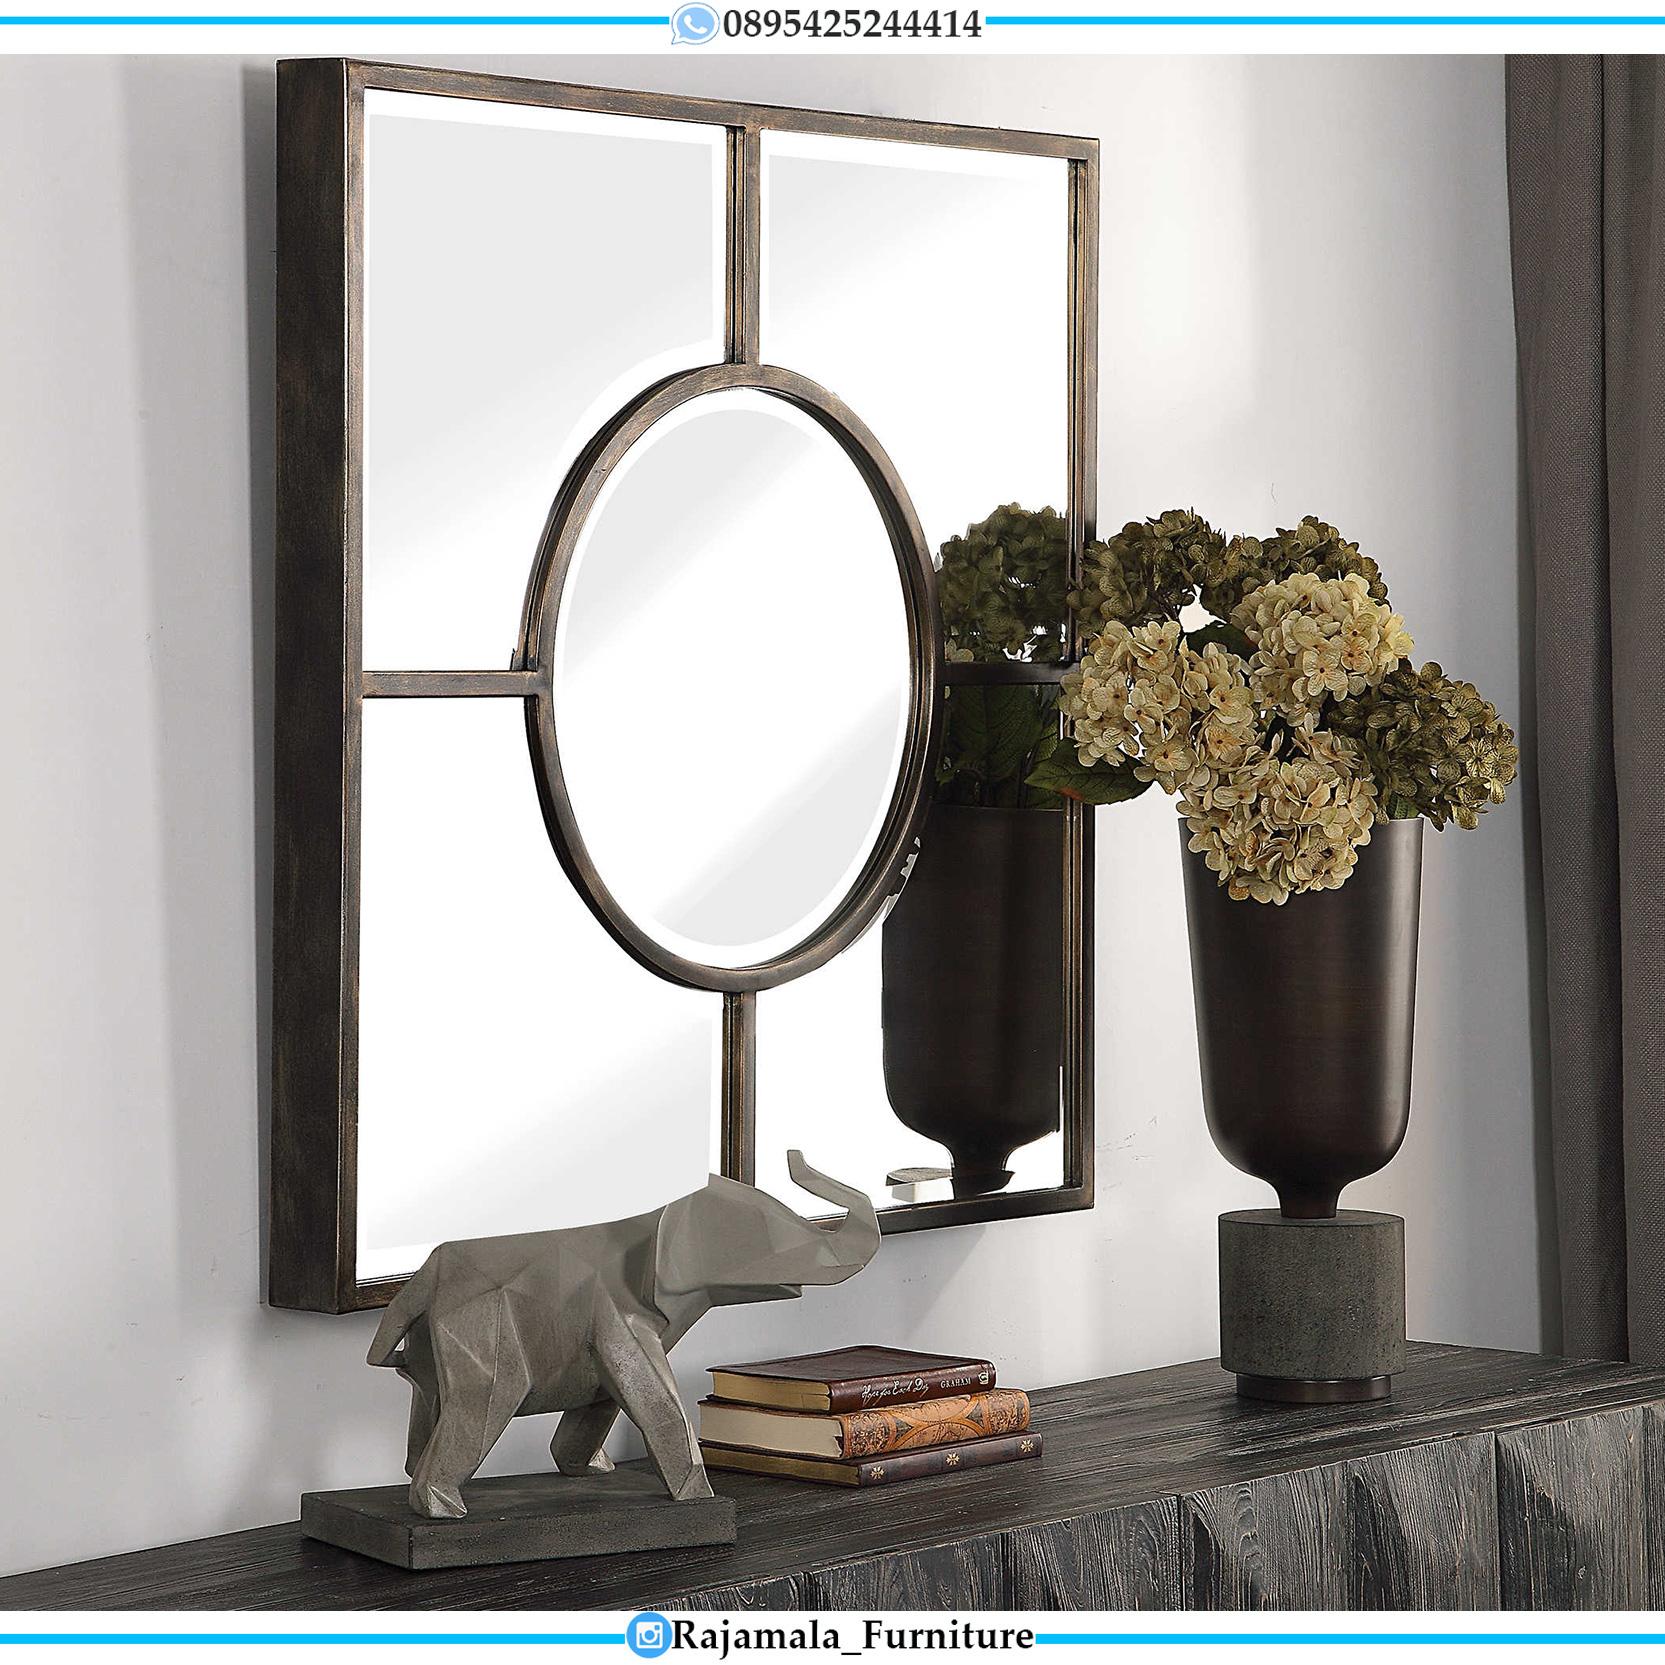 Kaca Hias Minimalis Living Room Inspiring Design Interior RM-0116